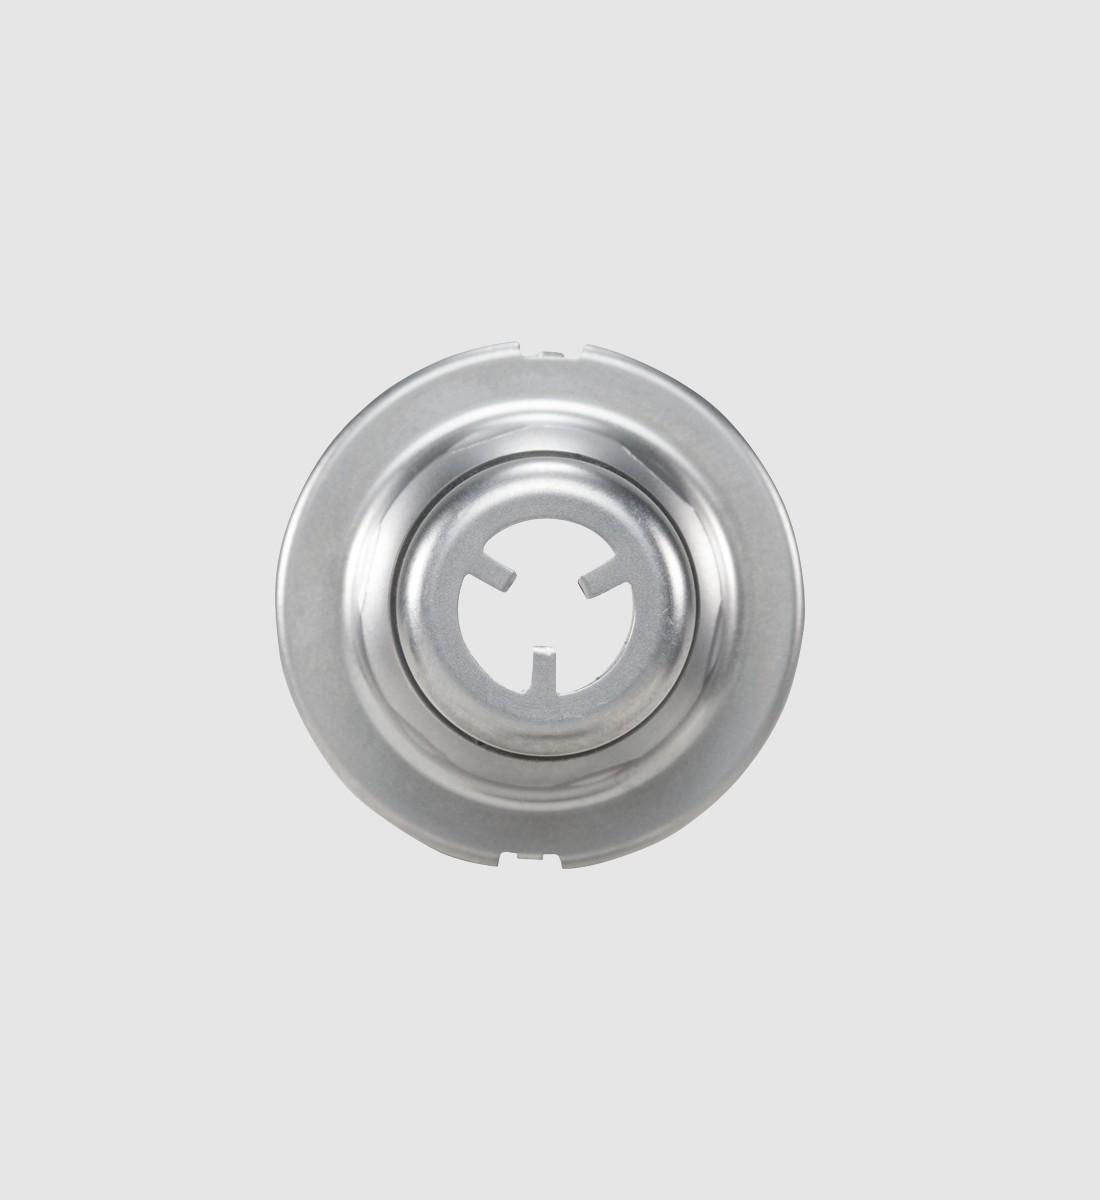 "Premium Krankoppling 21 mm (G 1/2"")"